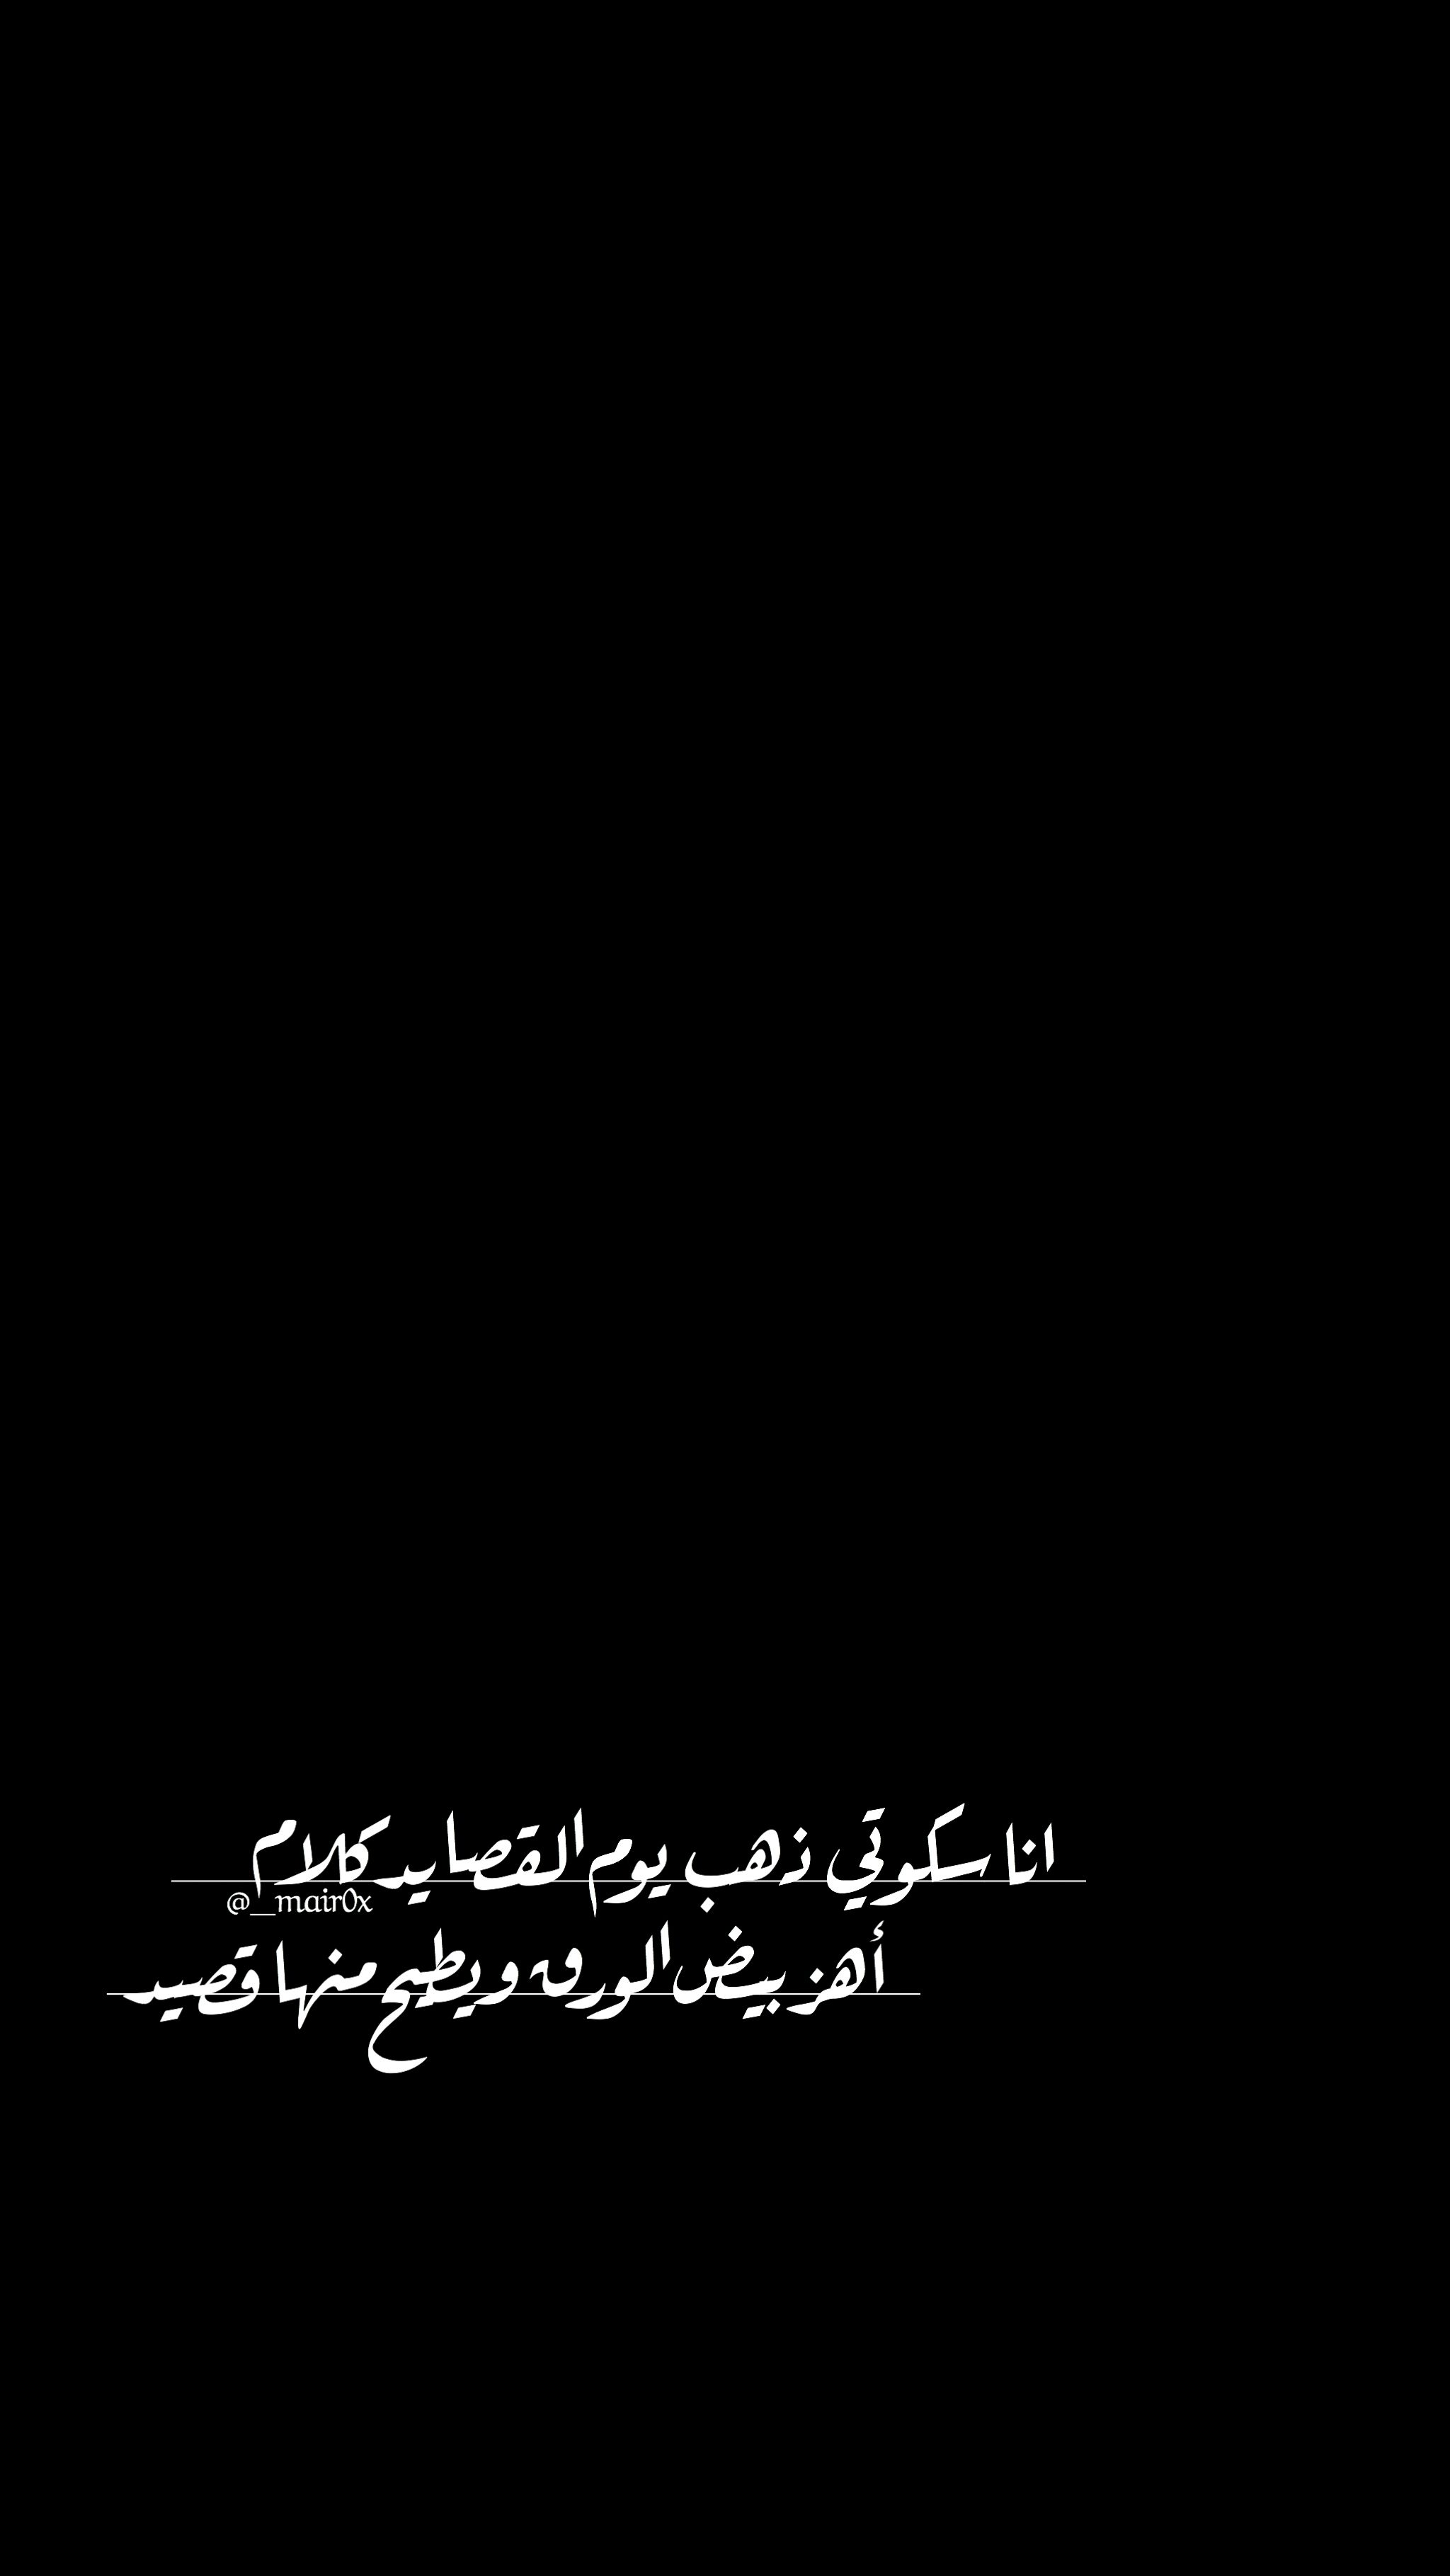 اقتباسات ابيض اسود اقتباسات سكوت ذهب معادن بيض الورق قصيد Snapchat Quotes Arabic Quotes Arabic Love Quotes